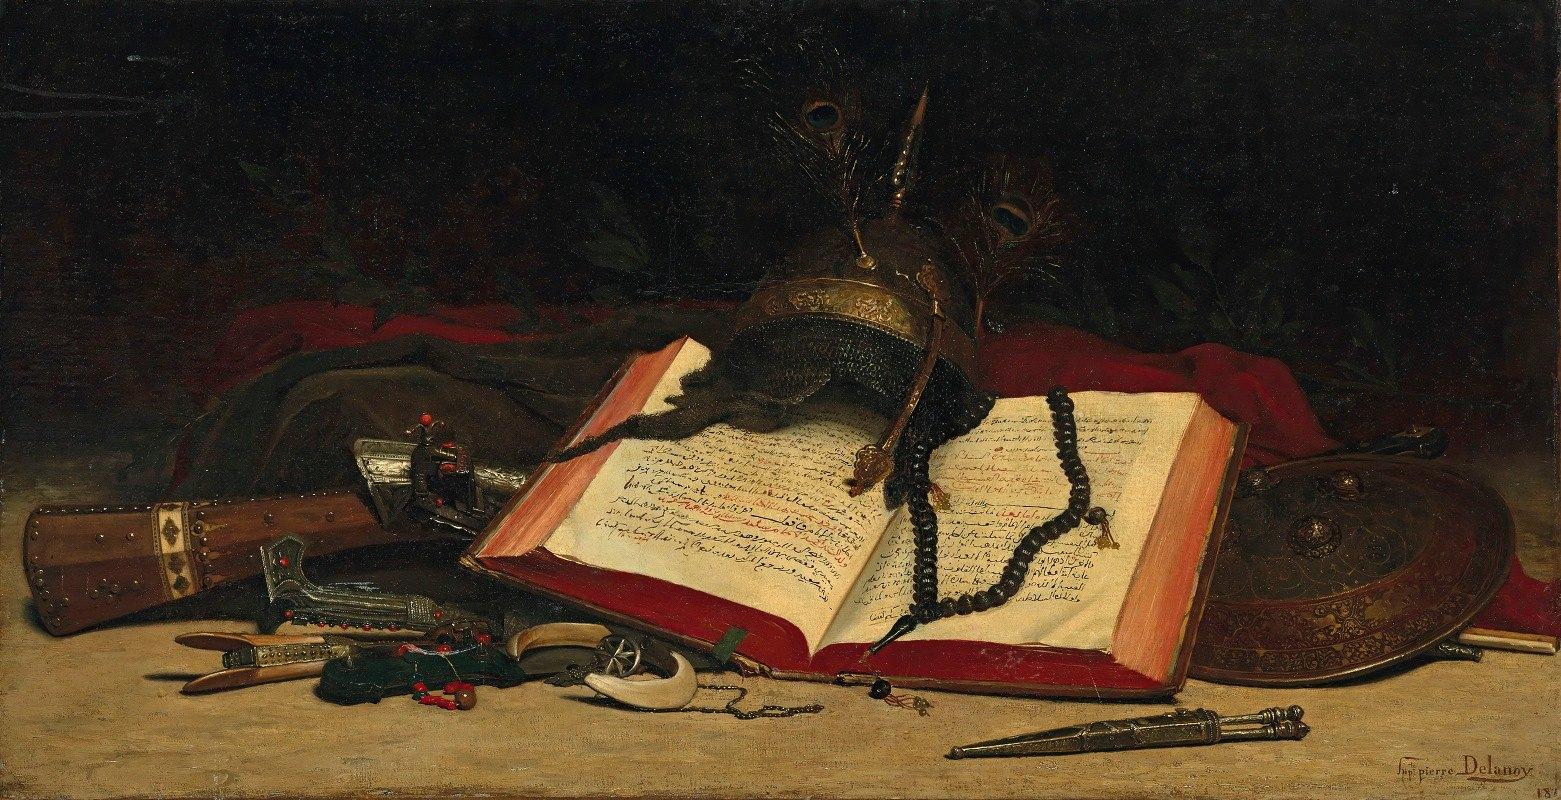 Hippolyte Pierre Delanoy - Orientalist still life with a Koran